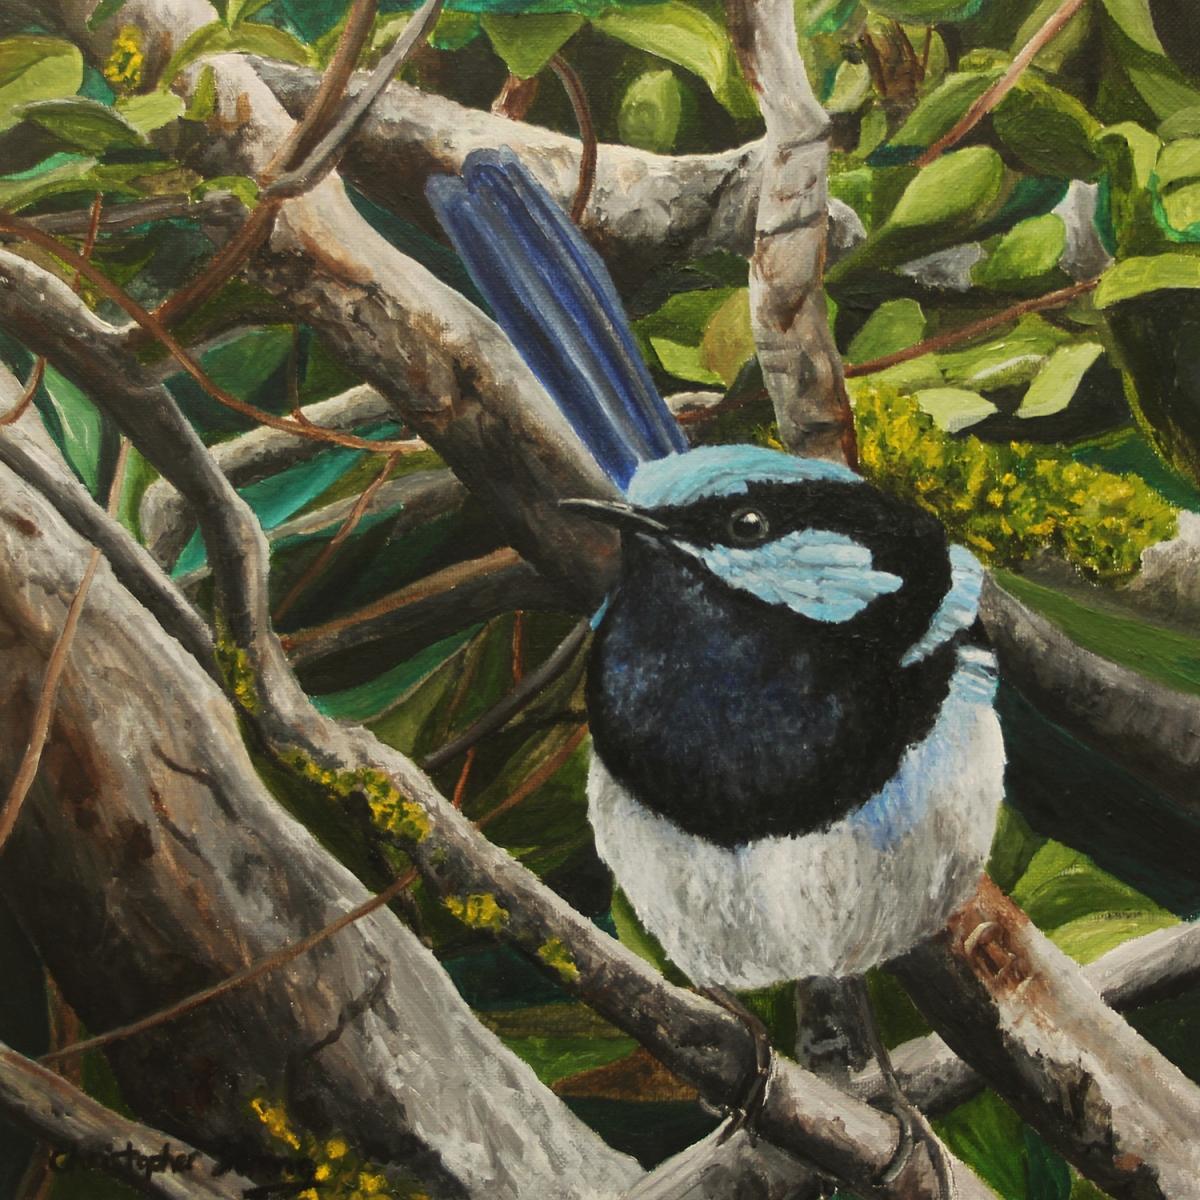 Fairy wren 1 - Oil on canvas - 30cm x 30cm